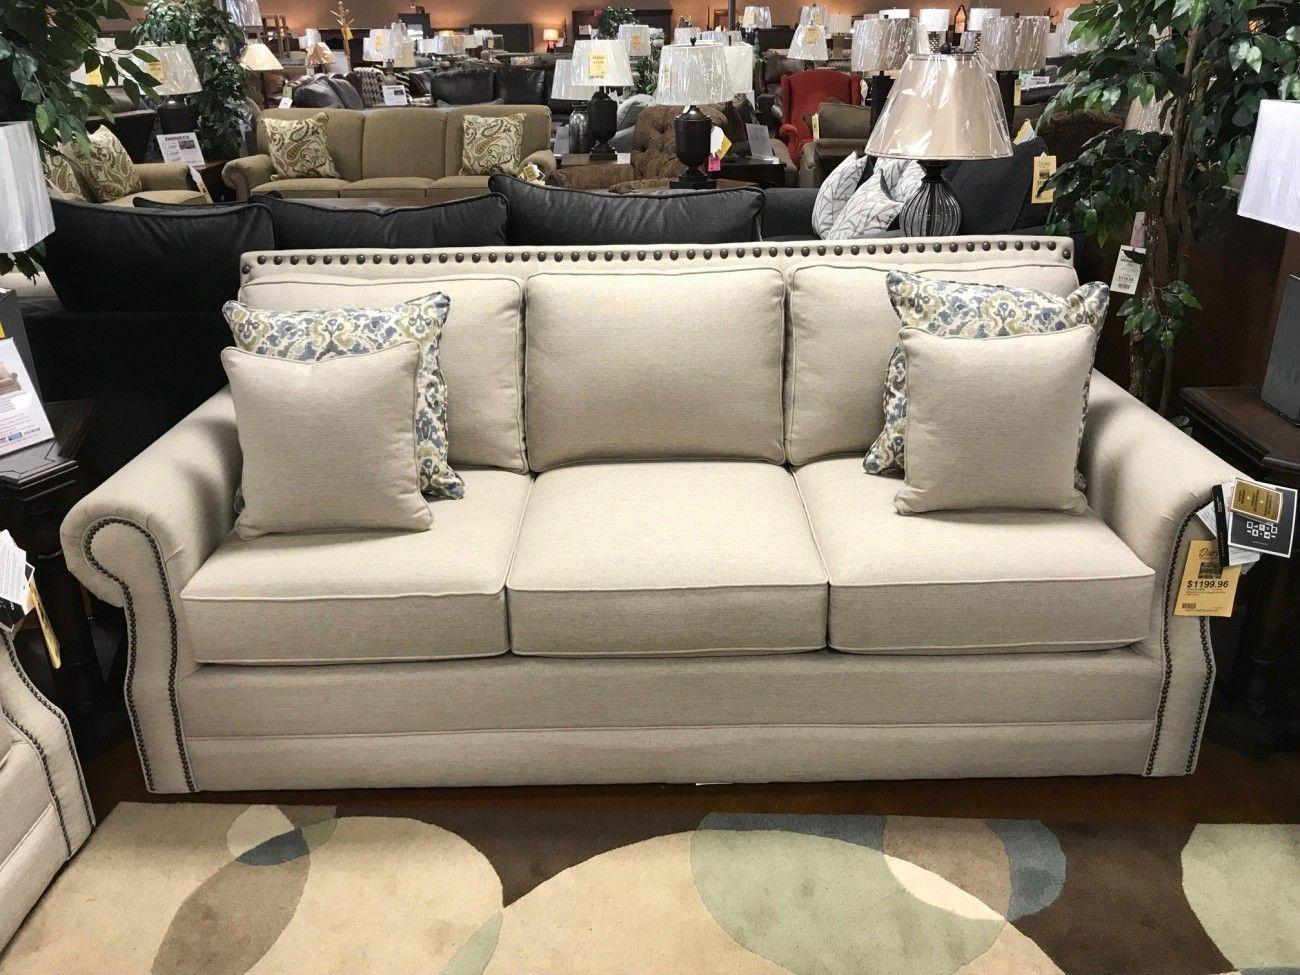 Buy Hubbard Sofa Bassett 3902 62fc Fc174 1 Online Darseys